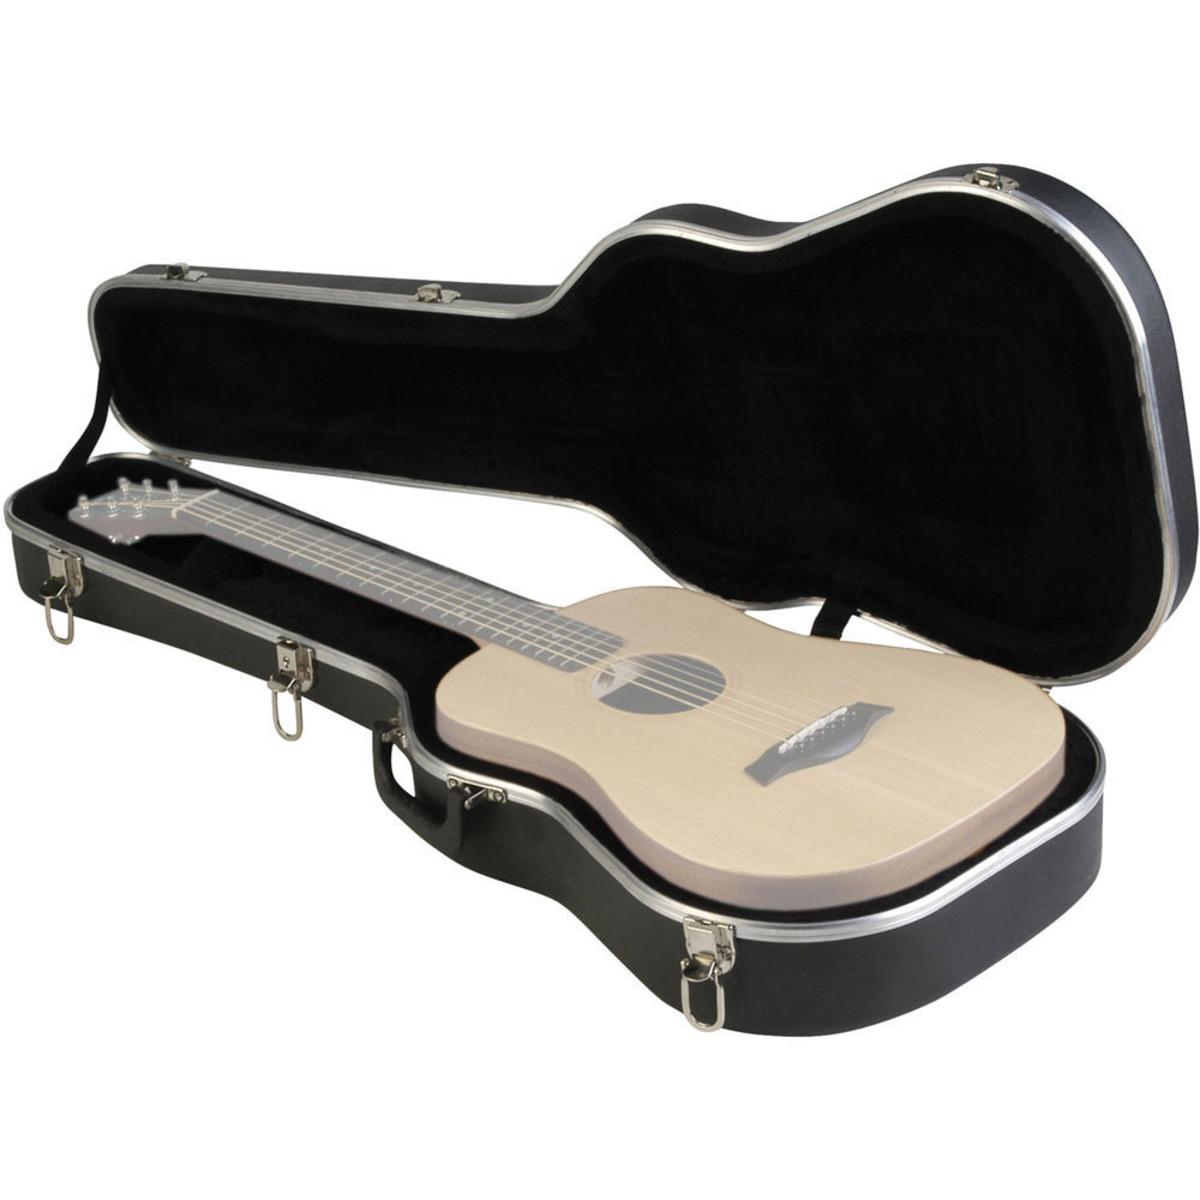 2cb5bde1b64 SKB Baby Taylor/Martin LX Hardshell Guitar Case - Open (Guitar Not  Included). Loading zoom. SKB Baby Taylor/Martin LX Hardshell Guitar Case ...